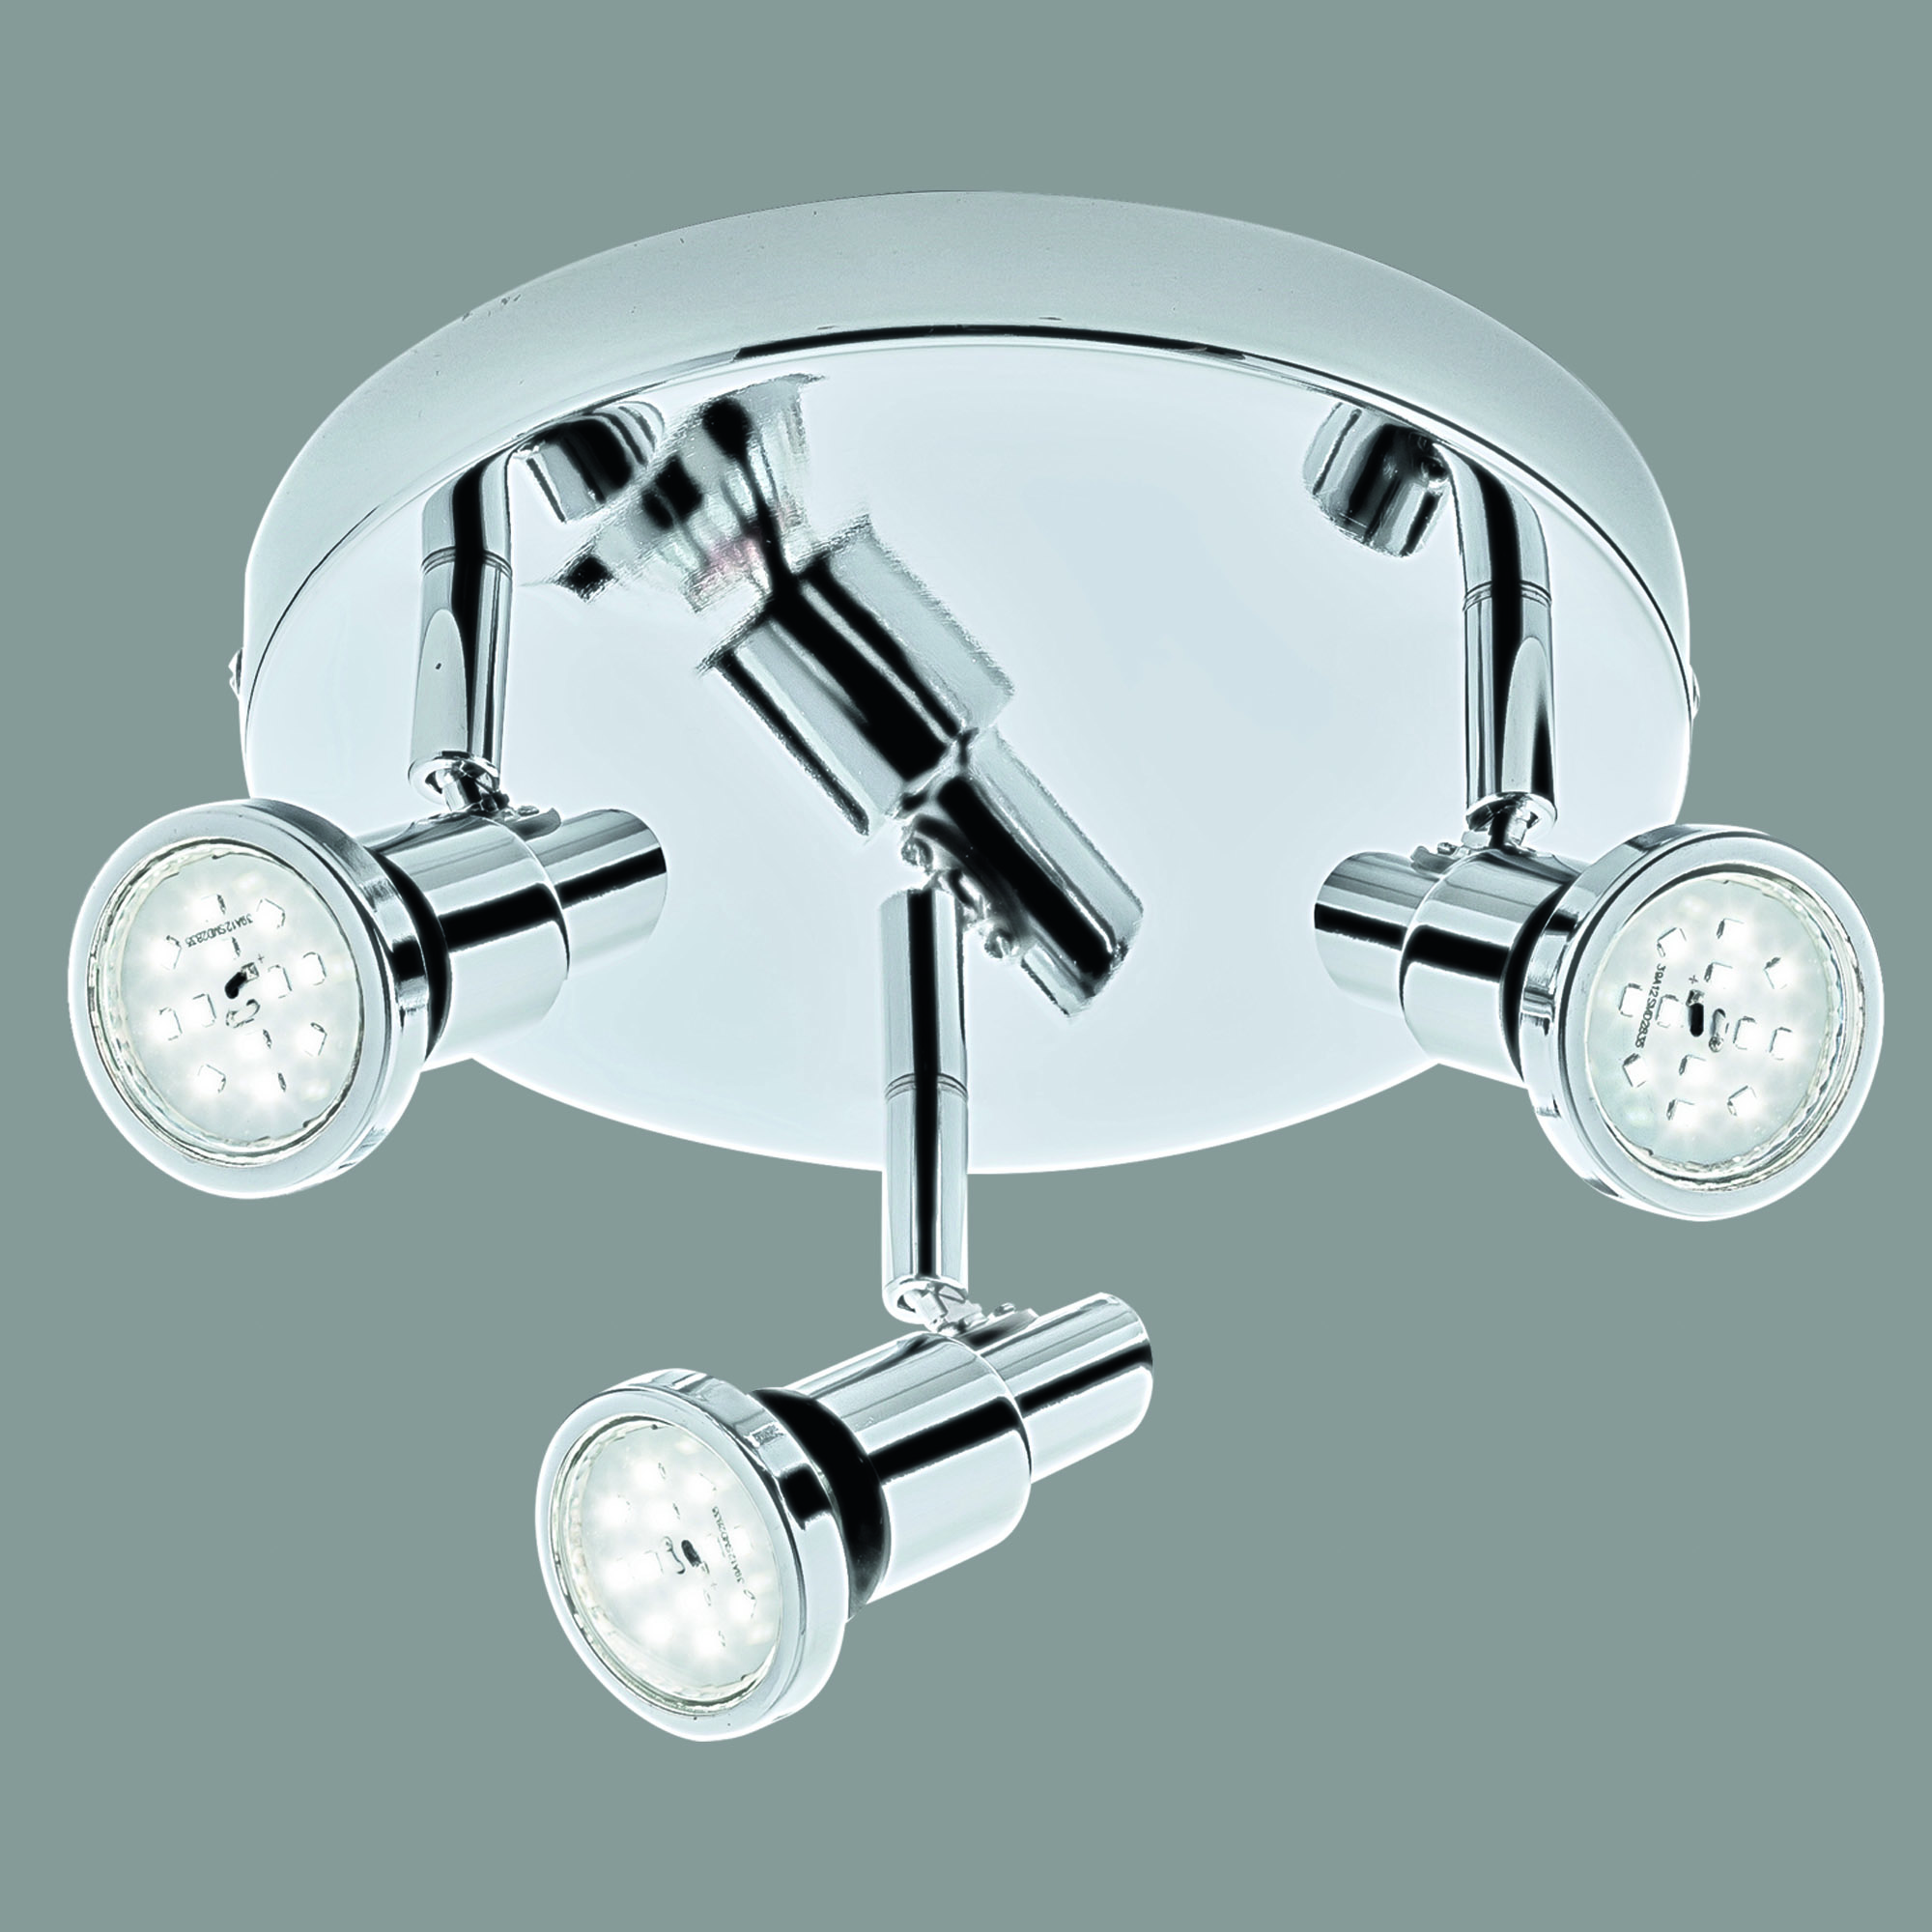 LED Spot Deckenleuchte, Ø 21 cm, 12 W, Chrom